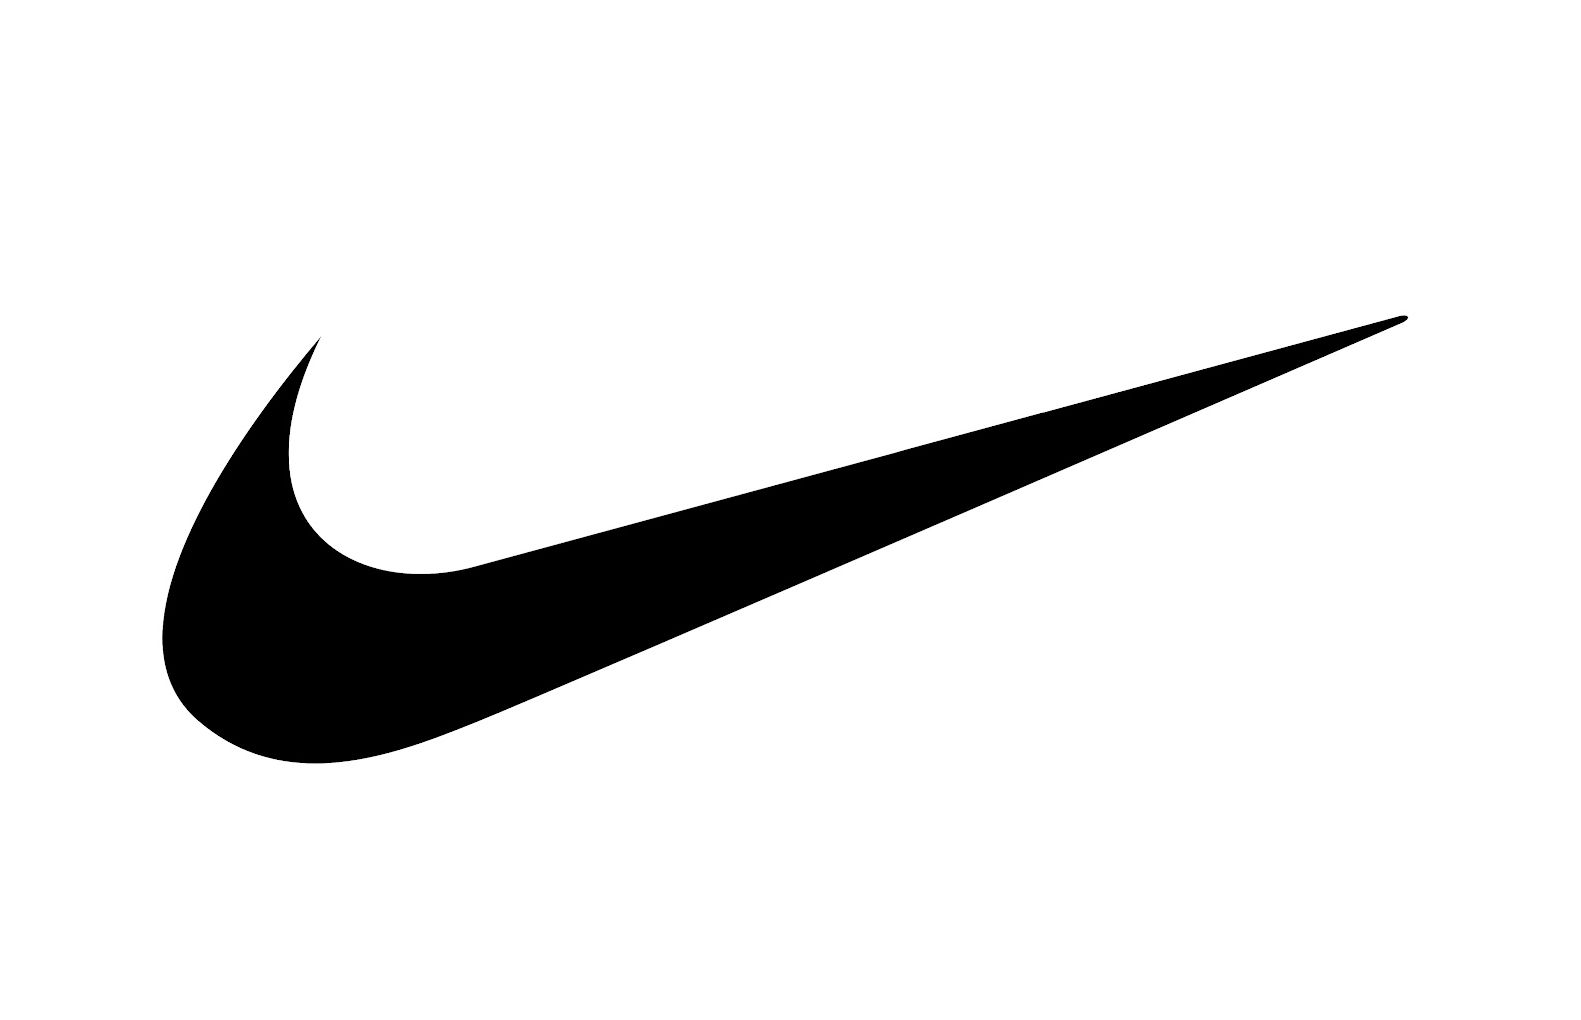 sick nike logos rh logolynx com Funny Nike Logos Awesome Nike Logos